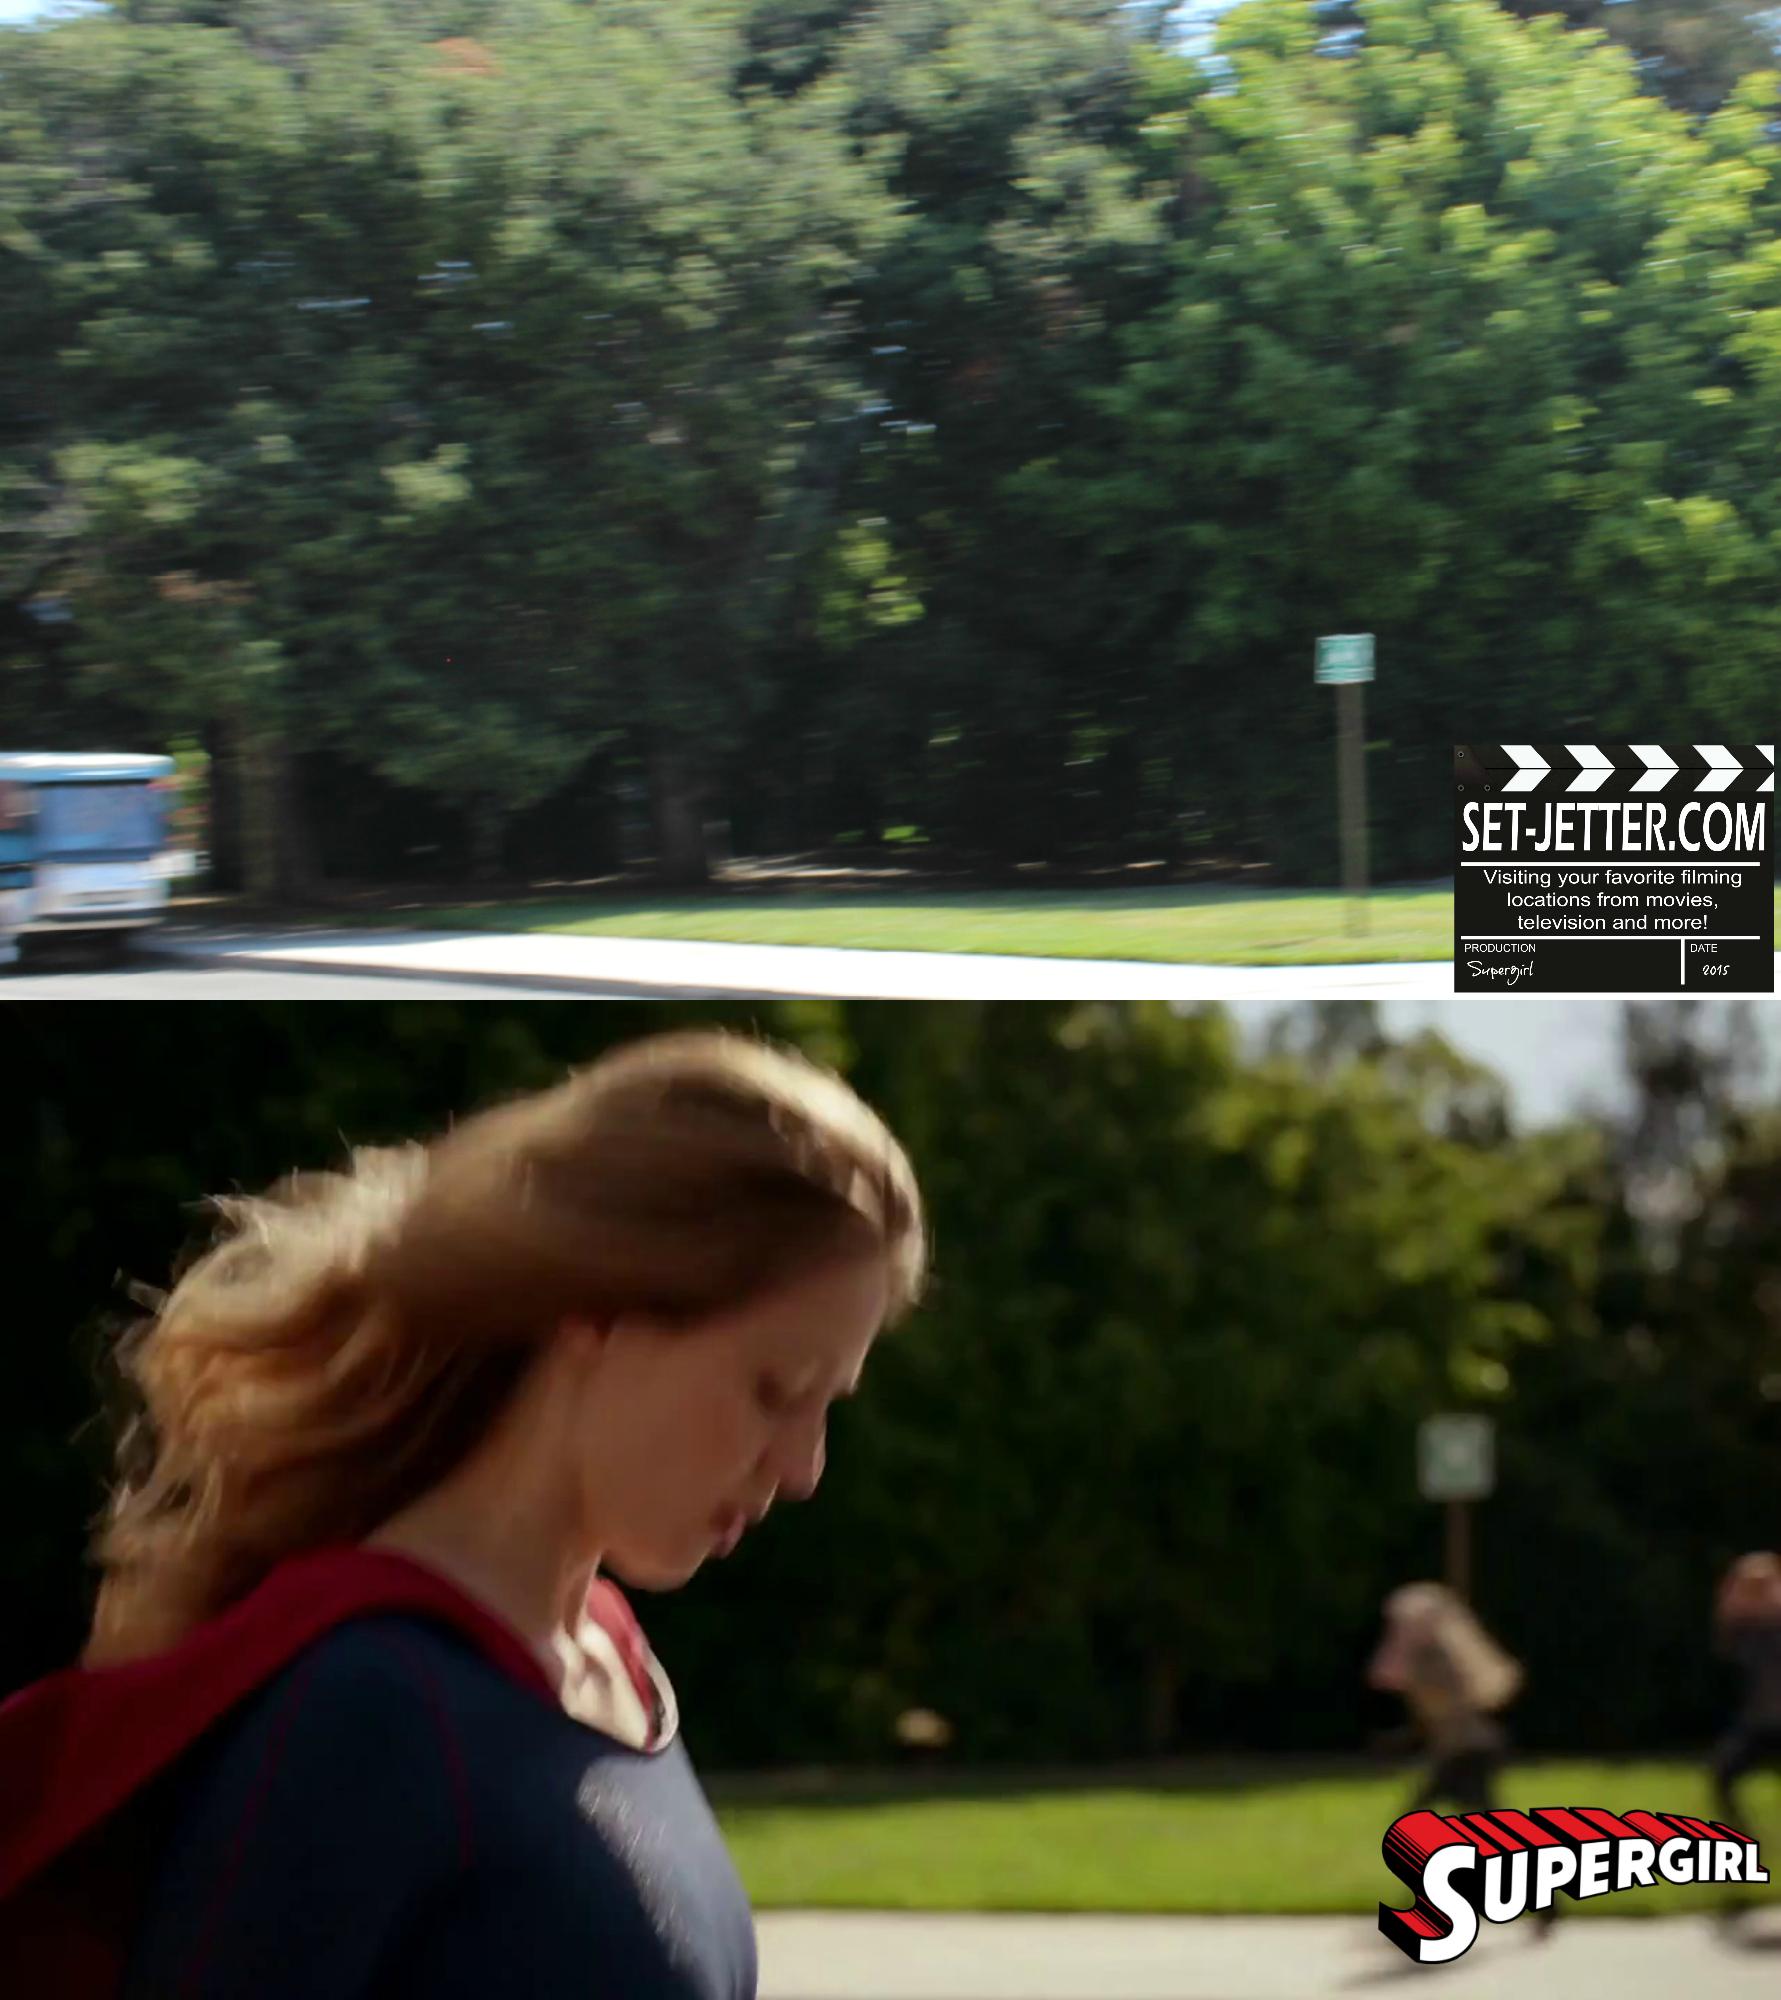 Supergirl comparison 24.jpg